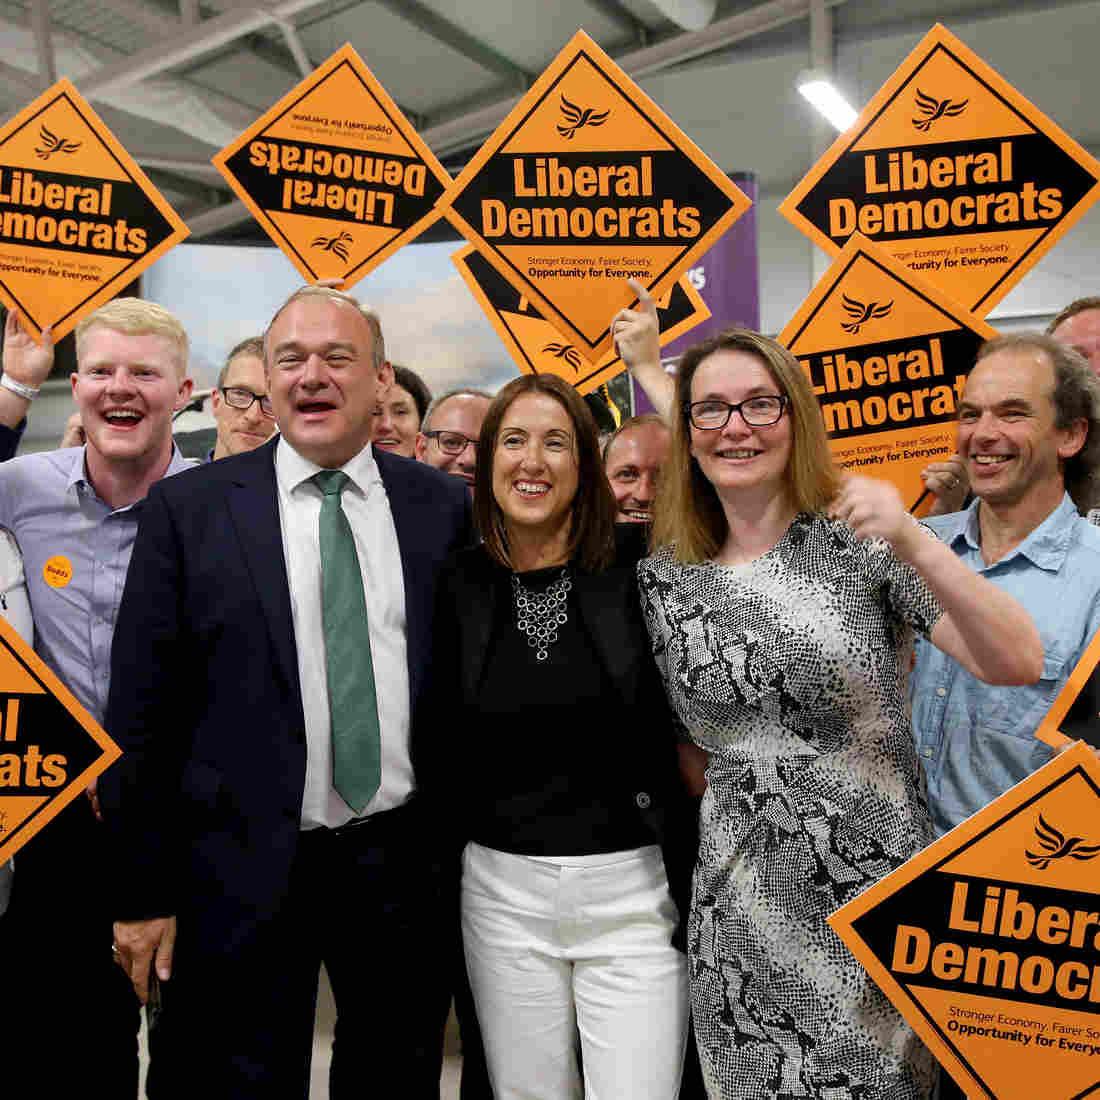 in-u-k-boris-johnson-s-conservatives-lose-seat-to_2.jpg